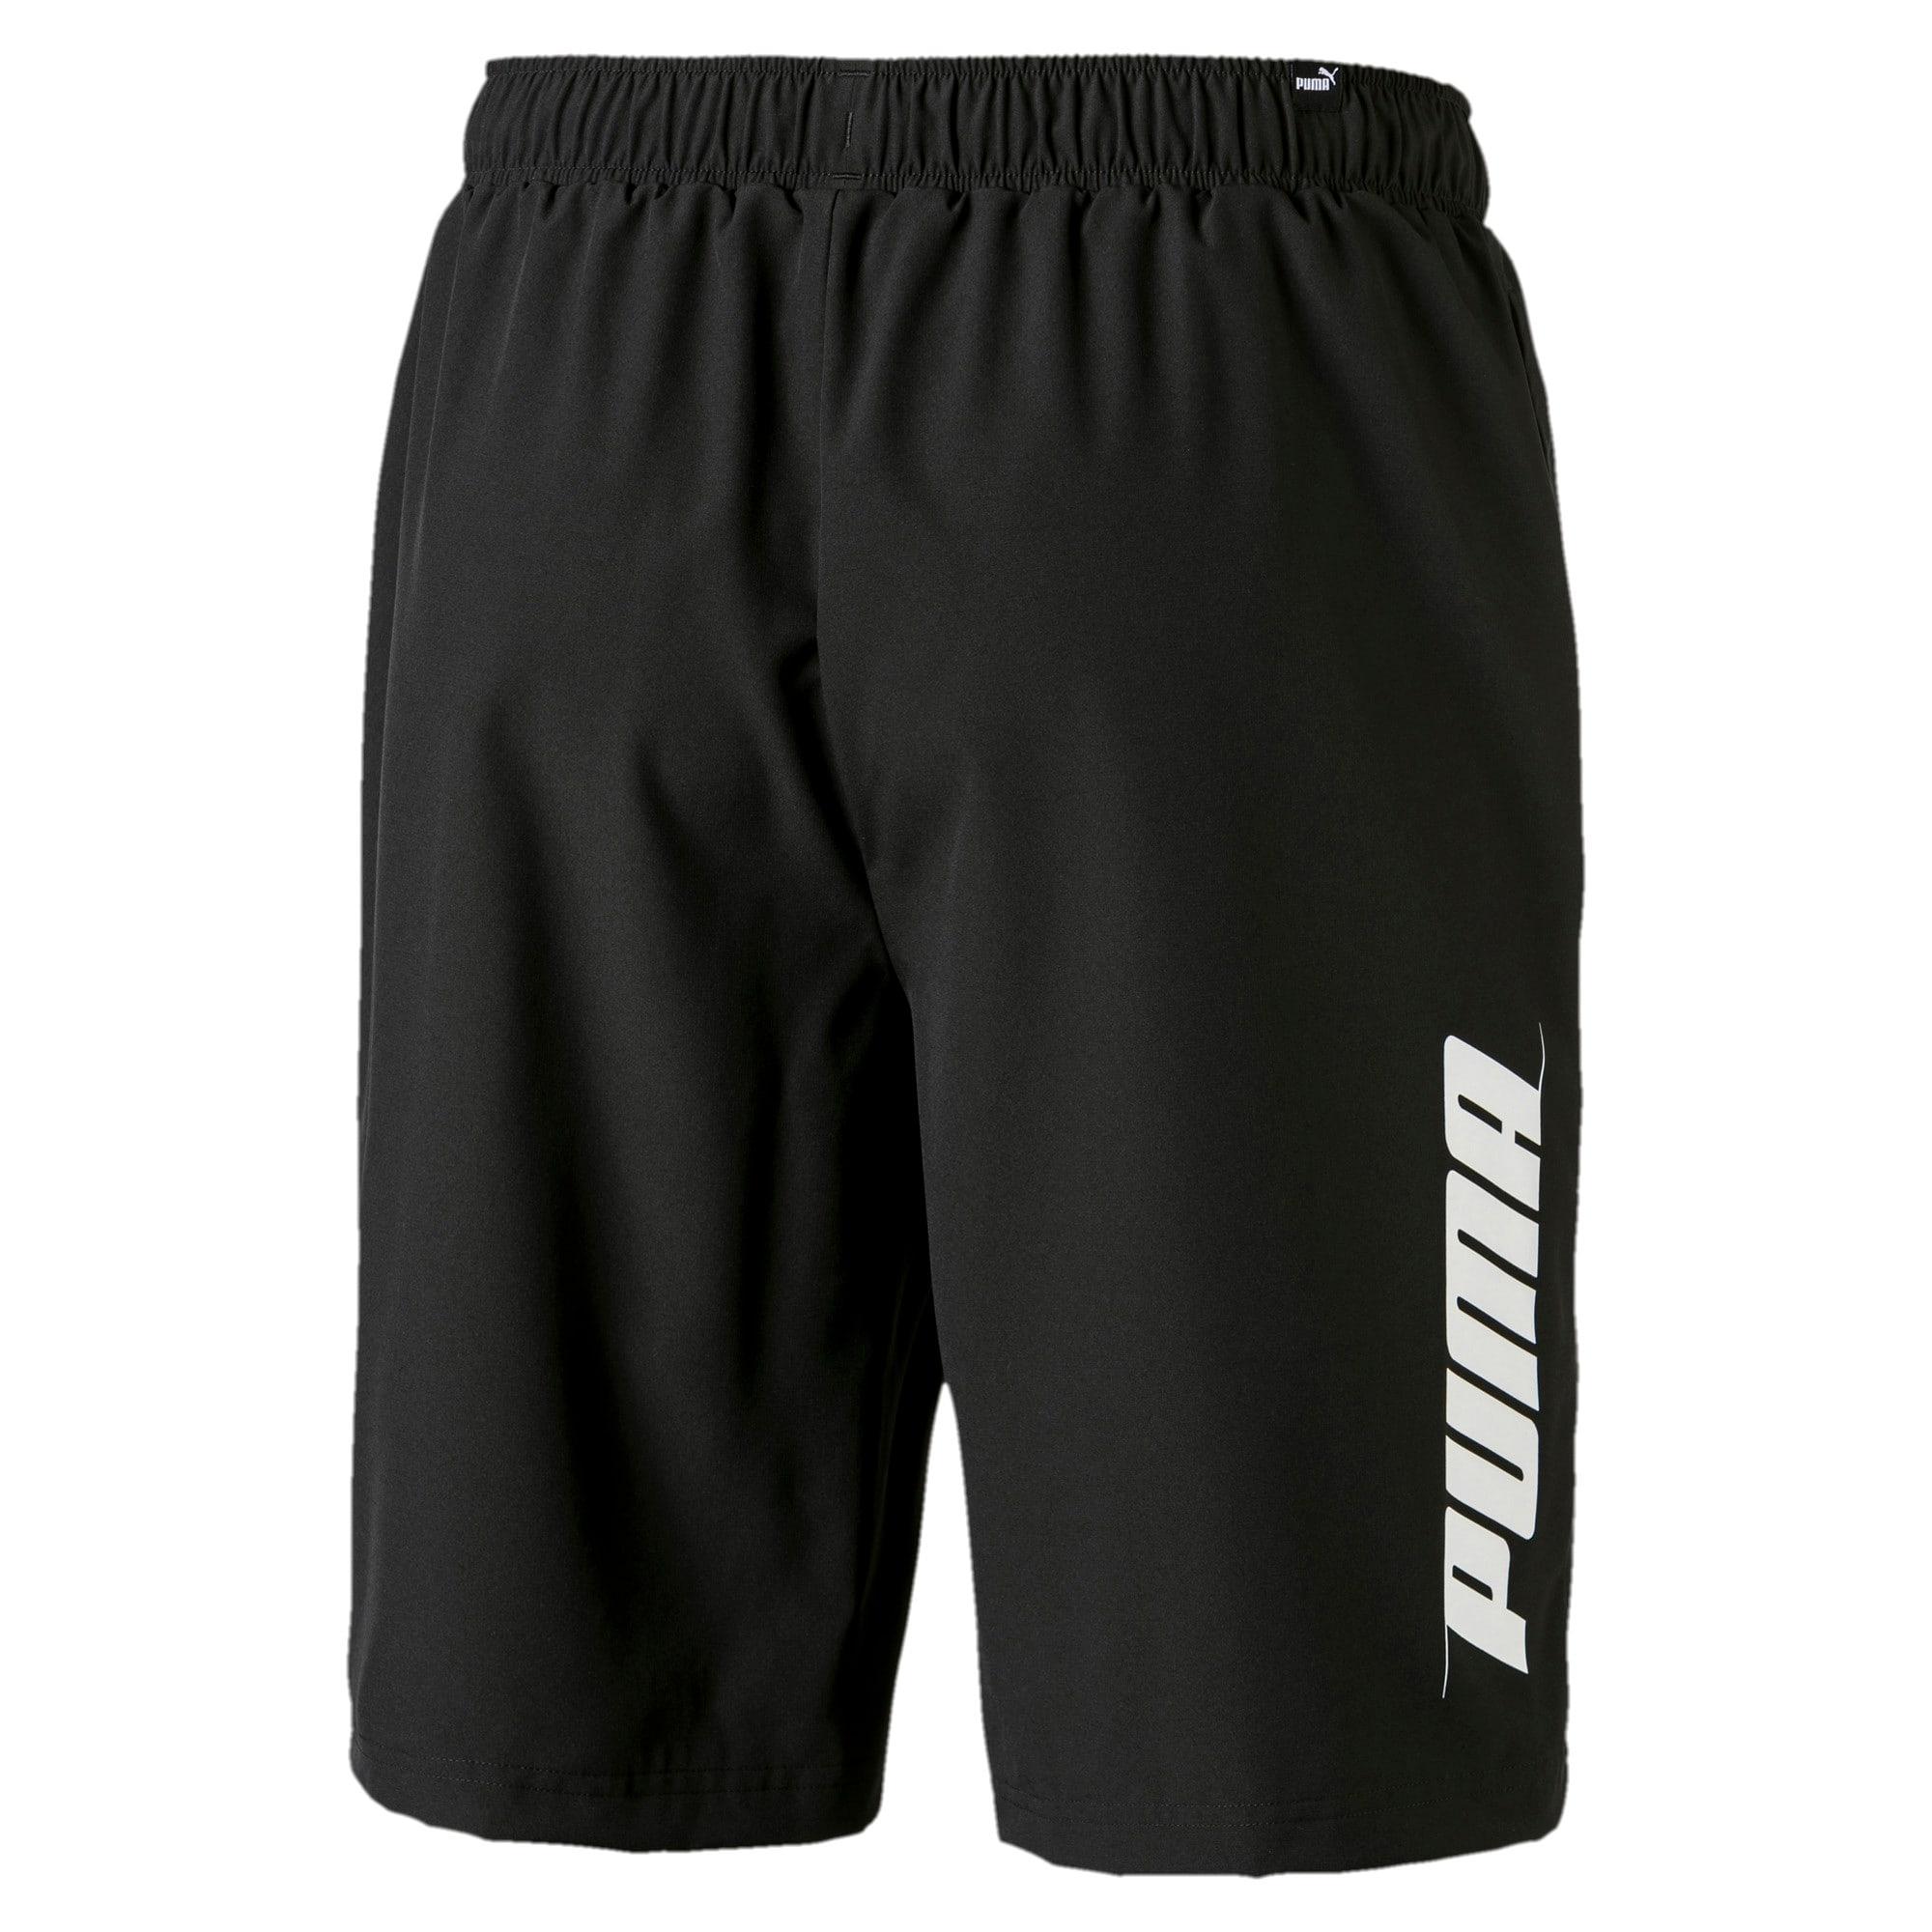 Thumbnail 2 of Rebel Herren Gewebte Shorts, Puma Black, medium